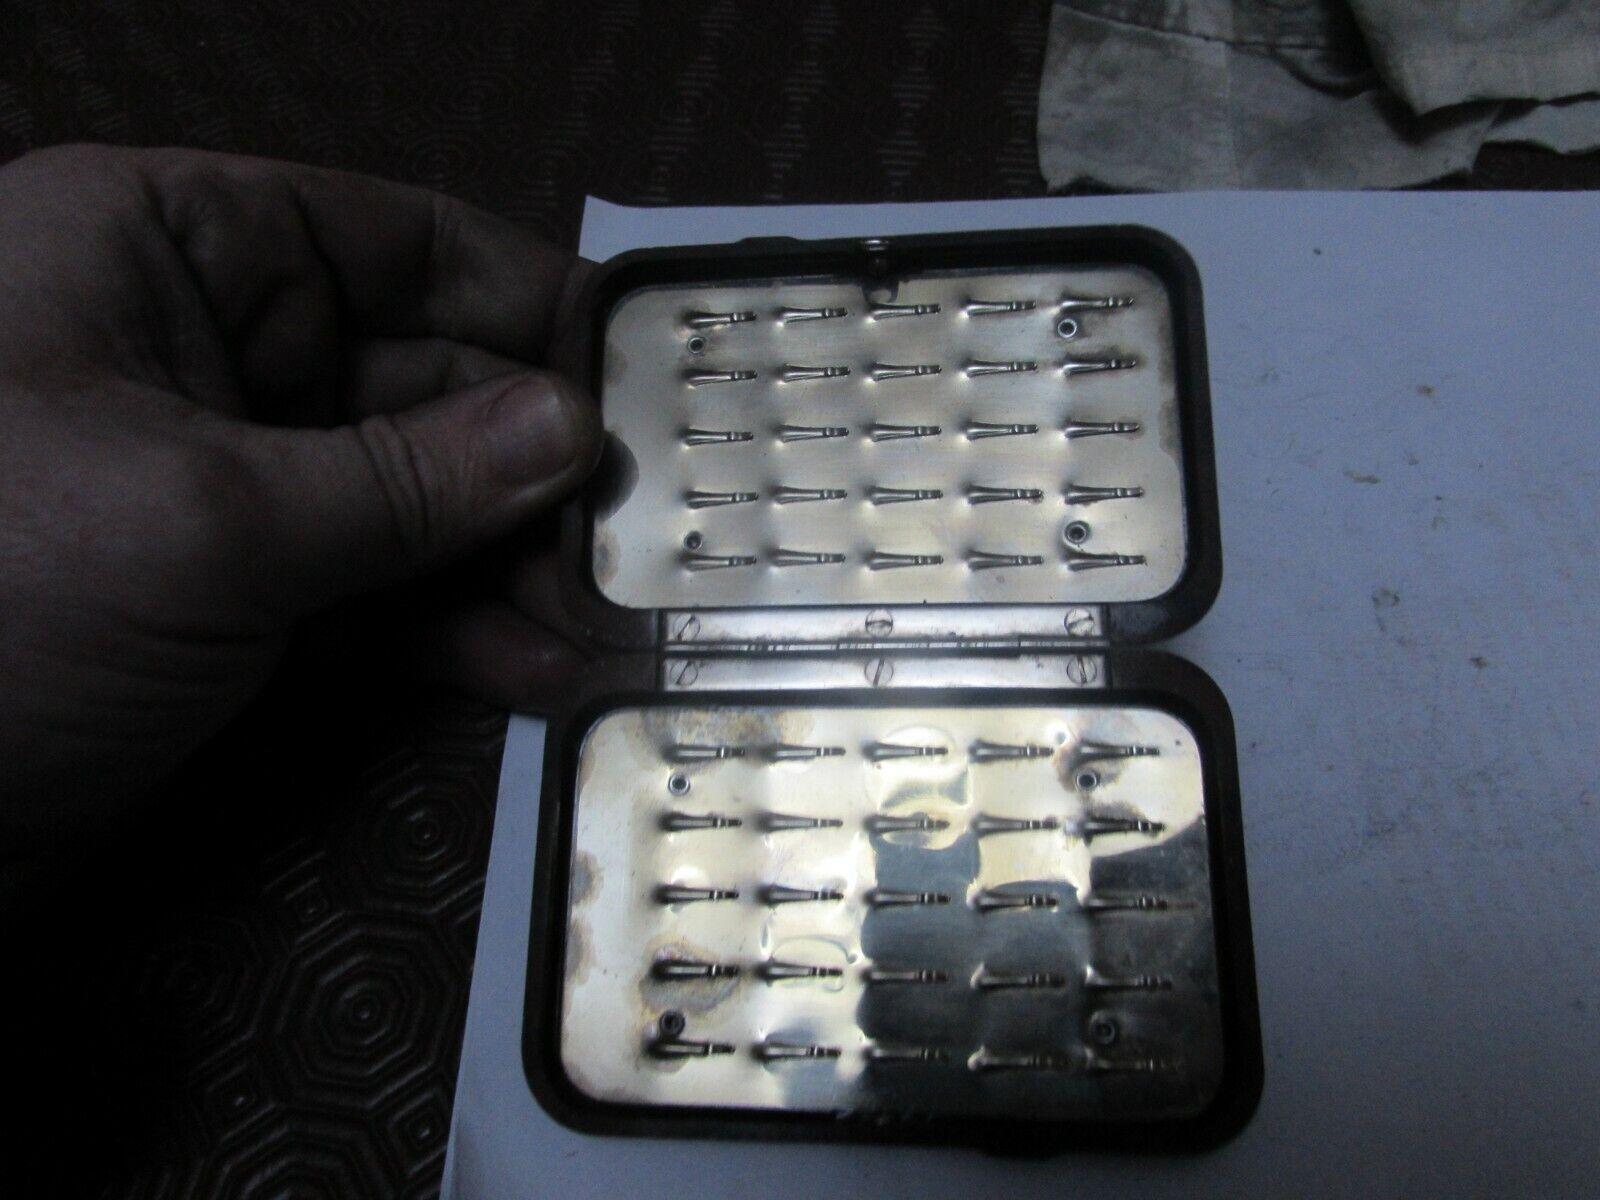 Molto buono Hardy Gilet Tasca trossoa Slim Clip PESCA A MOSCA SCATOLA NERODA amaranto.